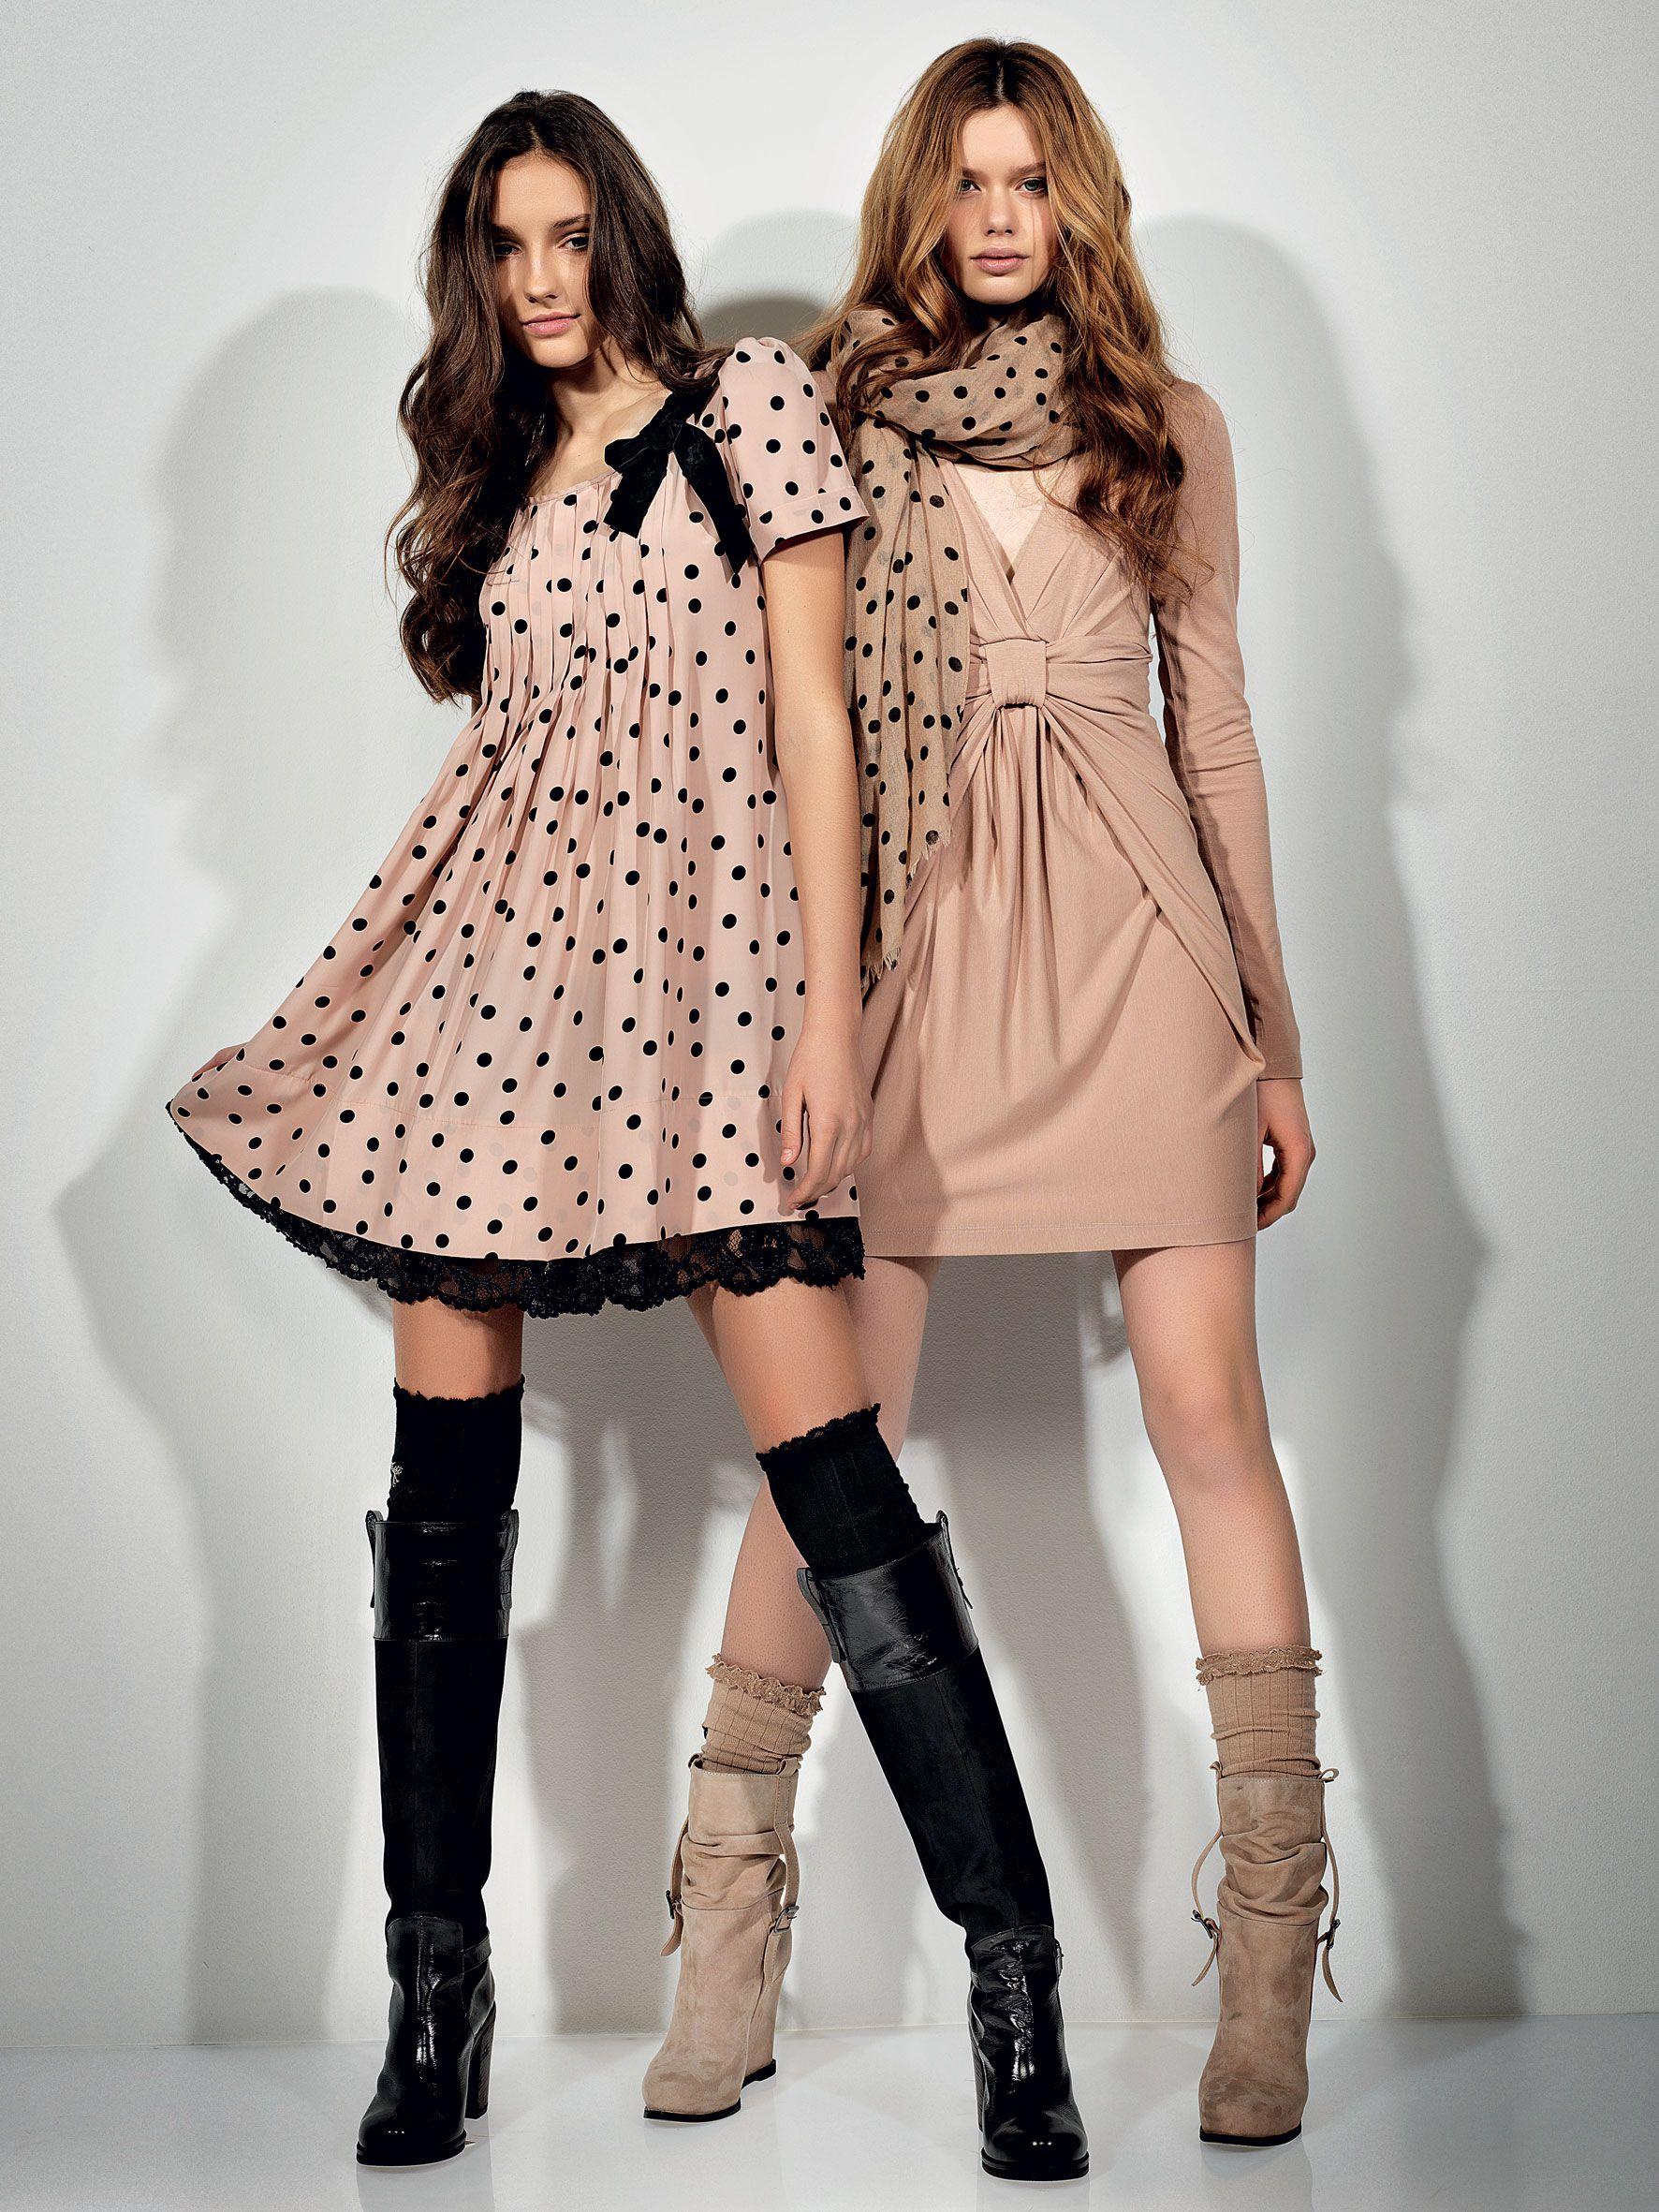 buy online 5a434 9182c SCEE by TWIN-SET Simona Barbieri: printed polka dot dress ...